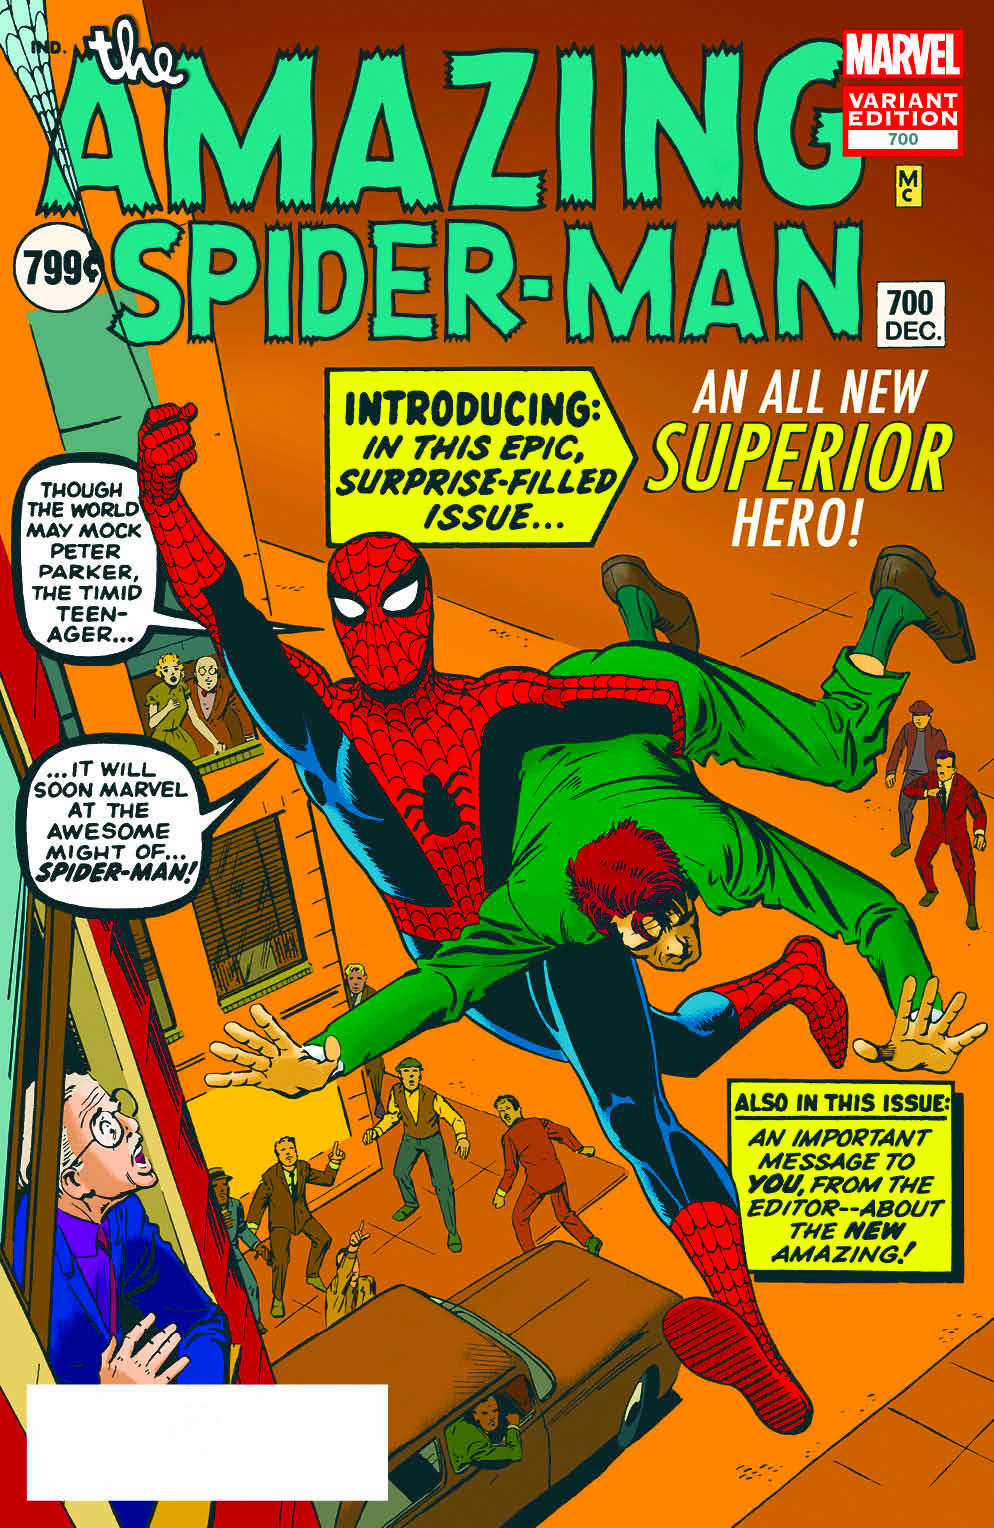 amazing_spider-man_vol_1_700_steve_ditko_variant